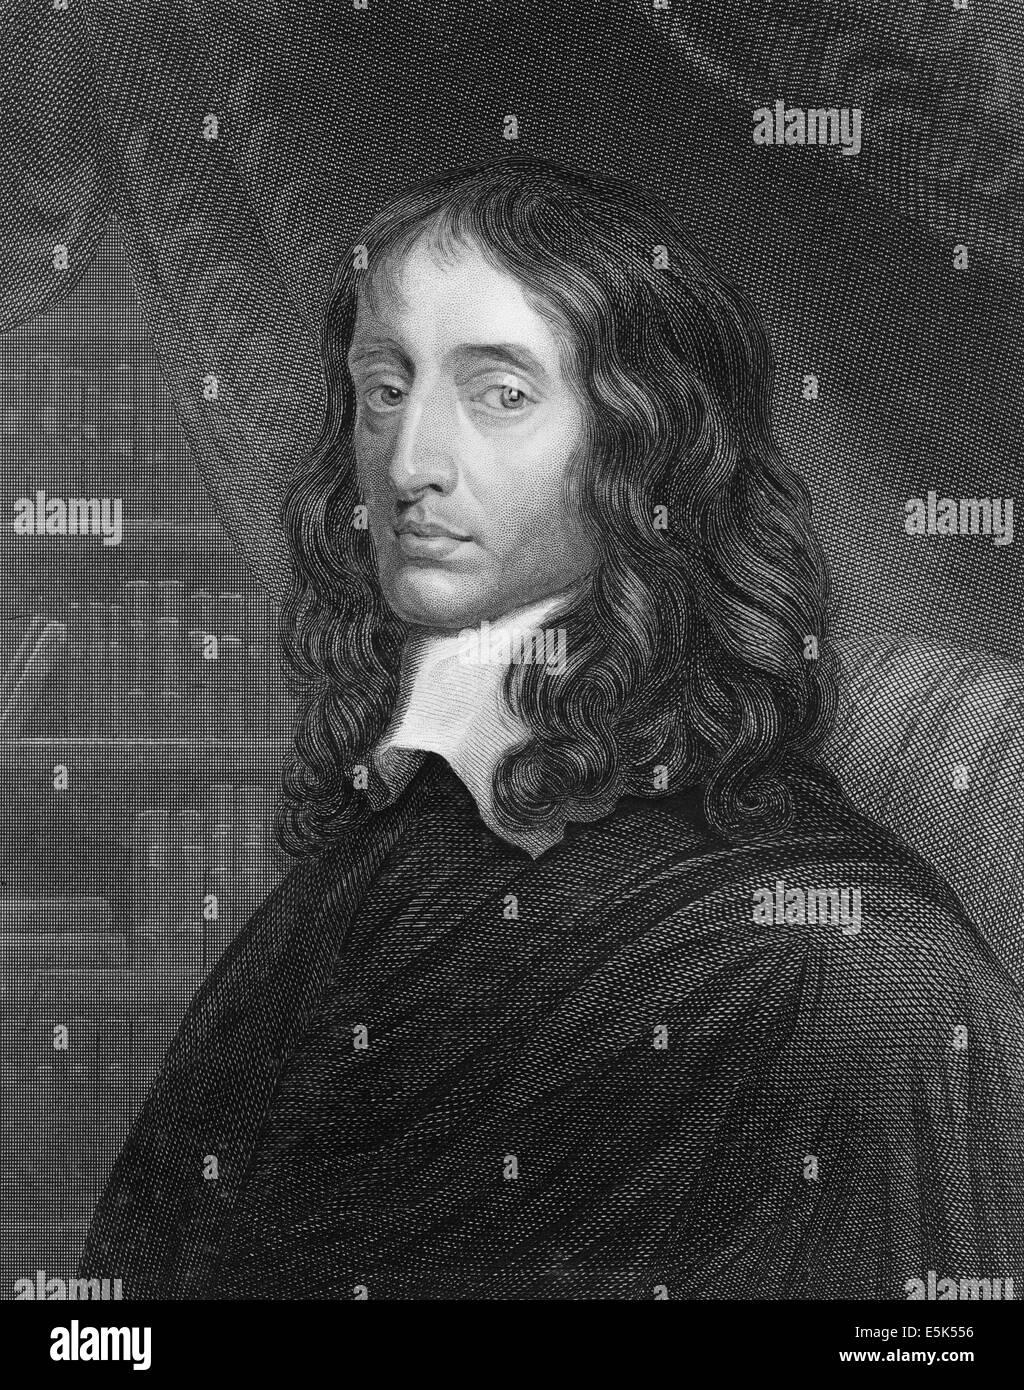 John Selden, 1584-1654, an English jurist, scholar and polymath, - Stock Image